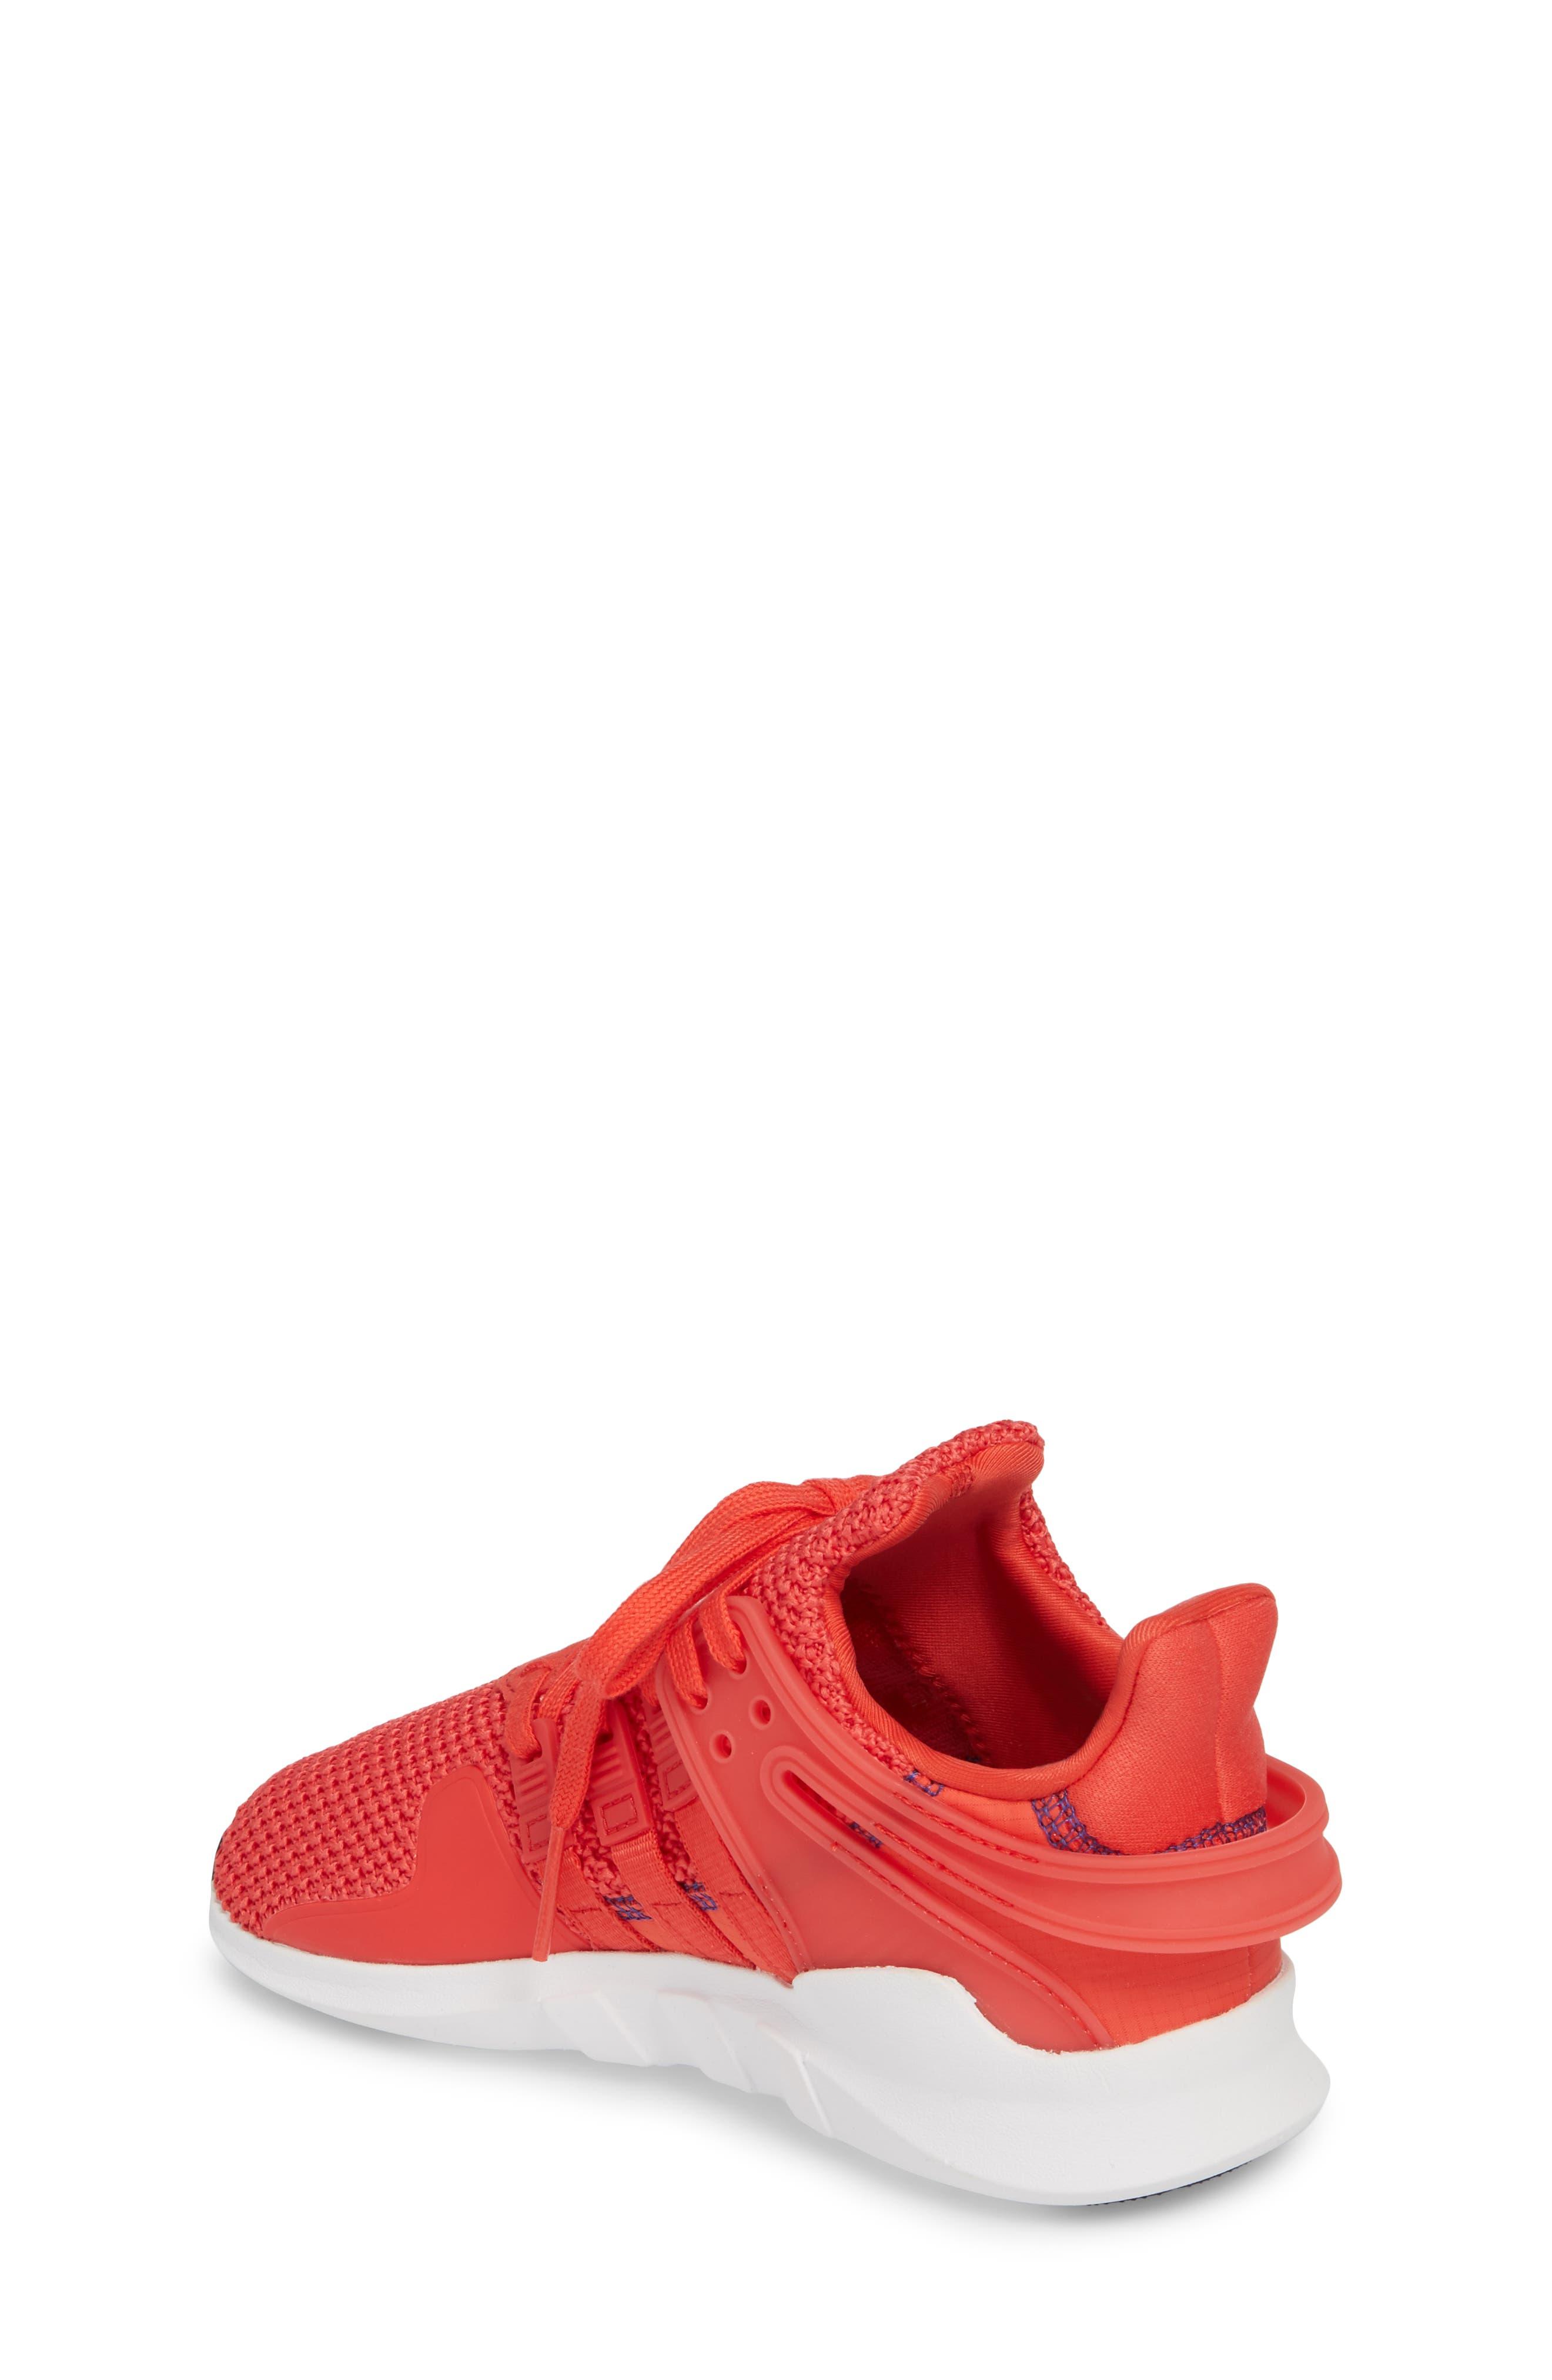 EQT Support Adv Sneaker,                             Alternate thumbnail 2, color,                             Coral White